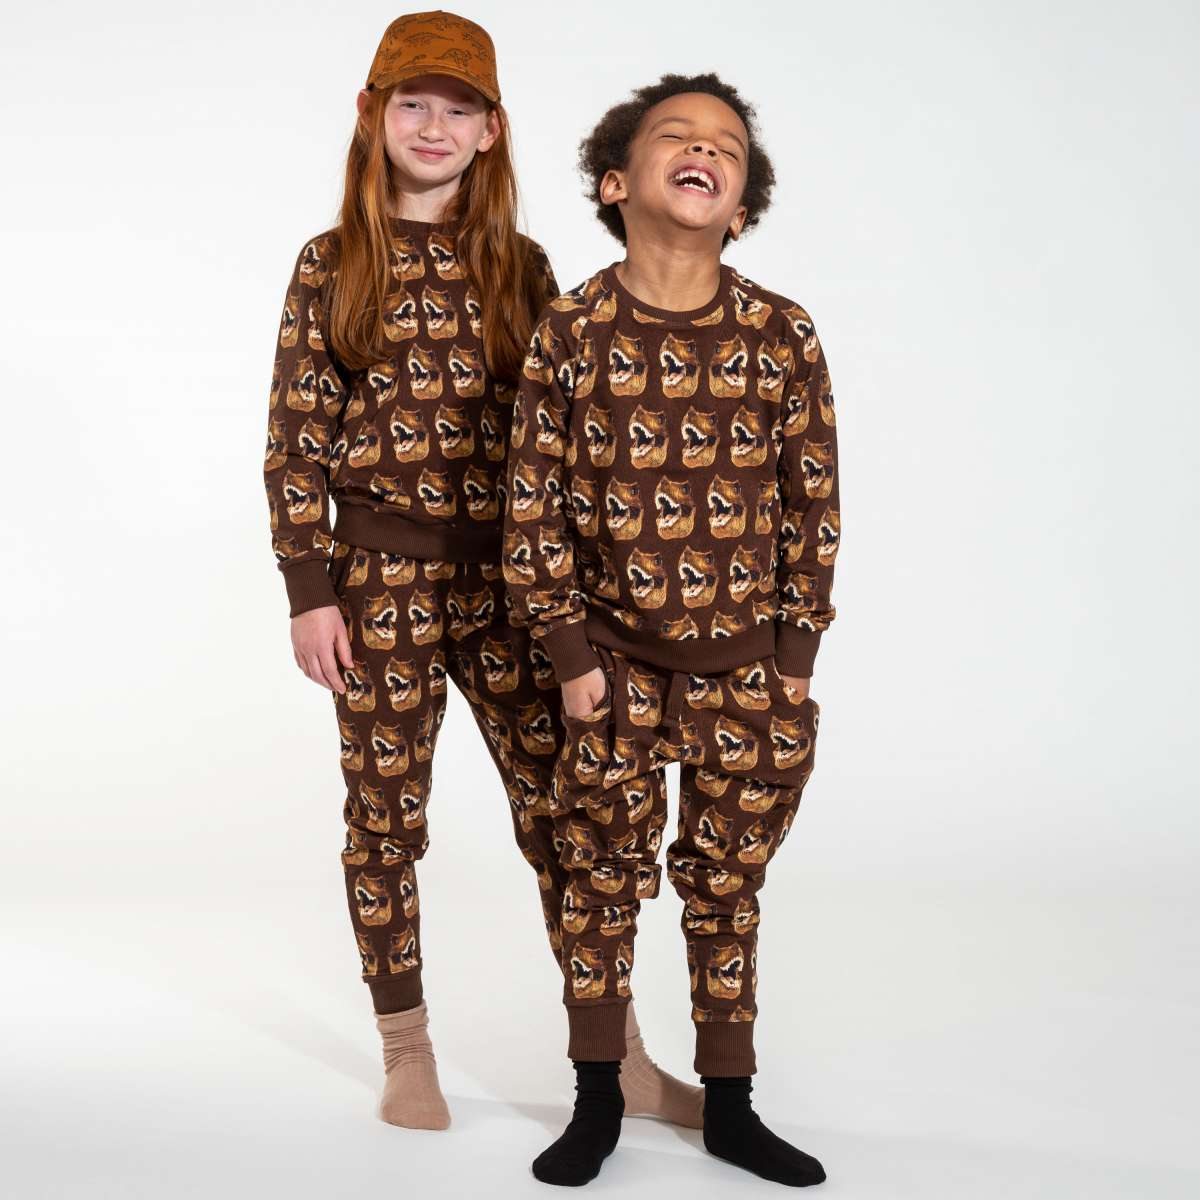 Bruine Dino pyjama van Snurk Amsterdam